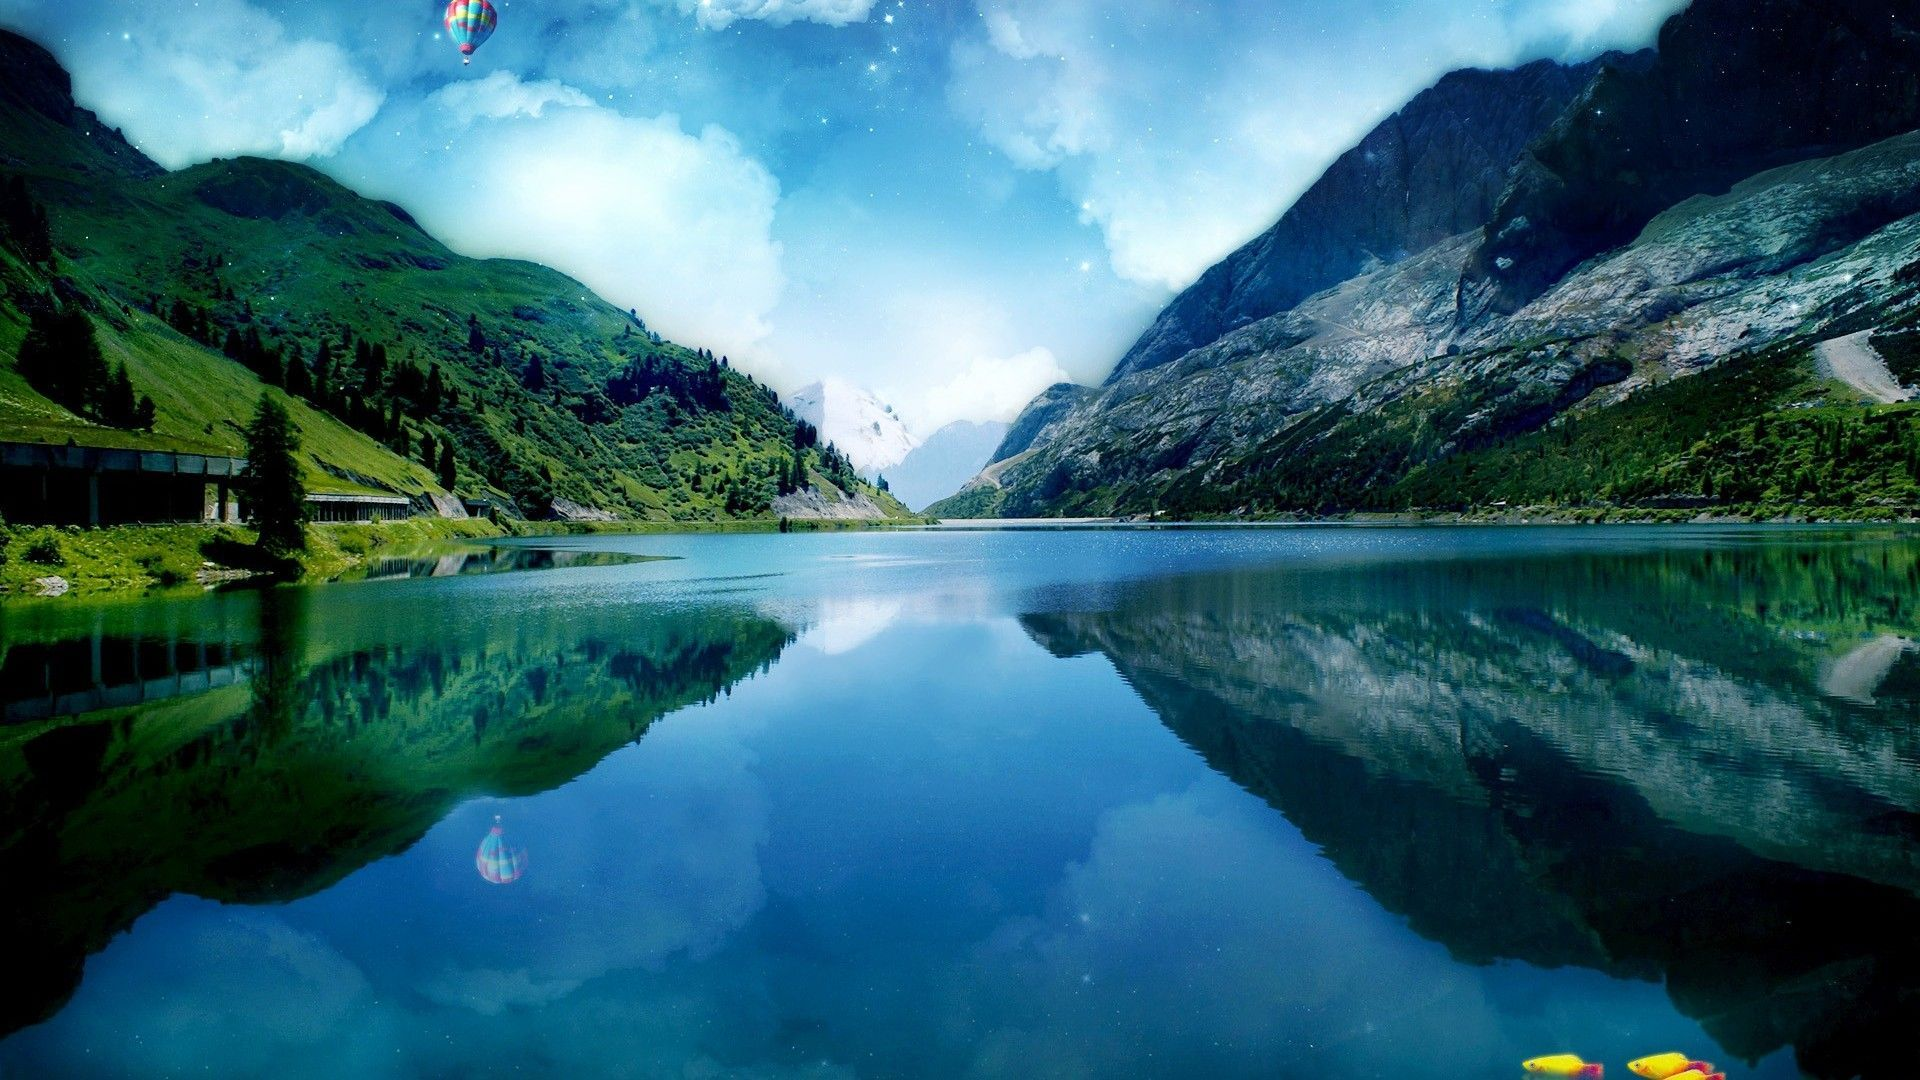 Full Hd Landscape Wallpapers Top Free Full Hd Landscape Backgrounds Wallpaperaccess